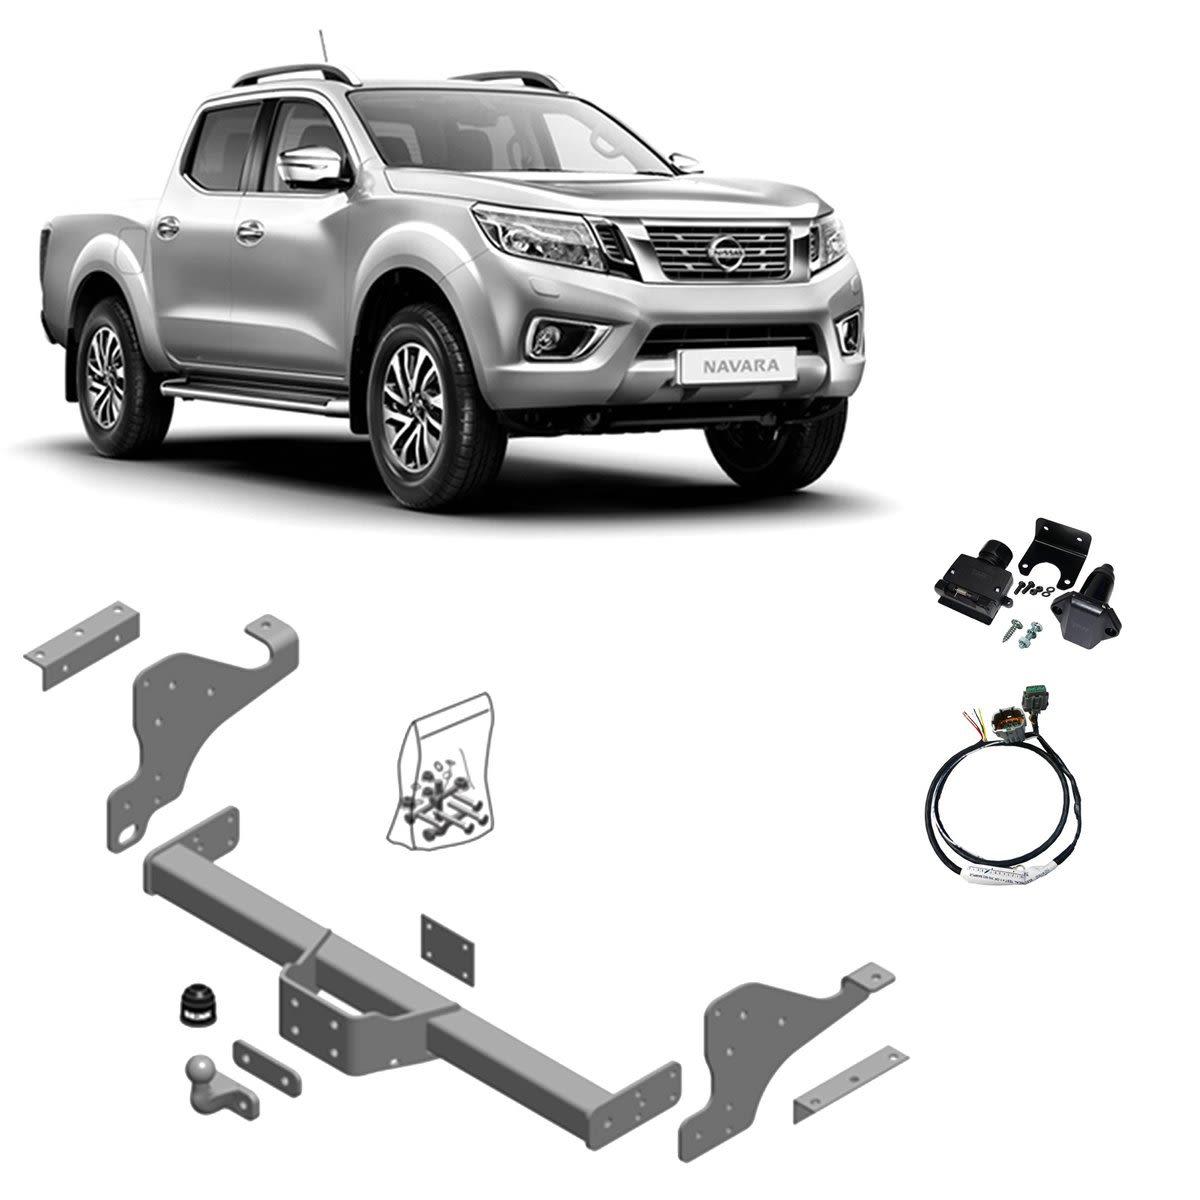 Brink Towbar to suit Nissan Navara (01/2015 - on)